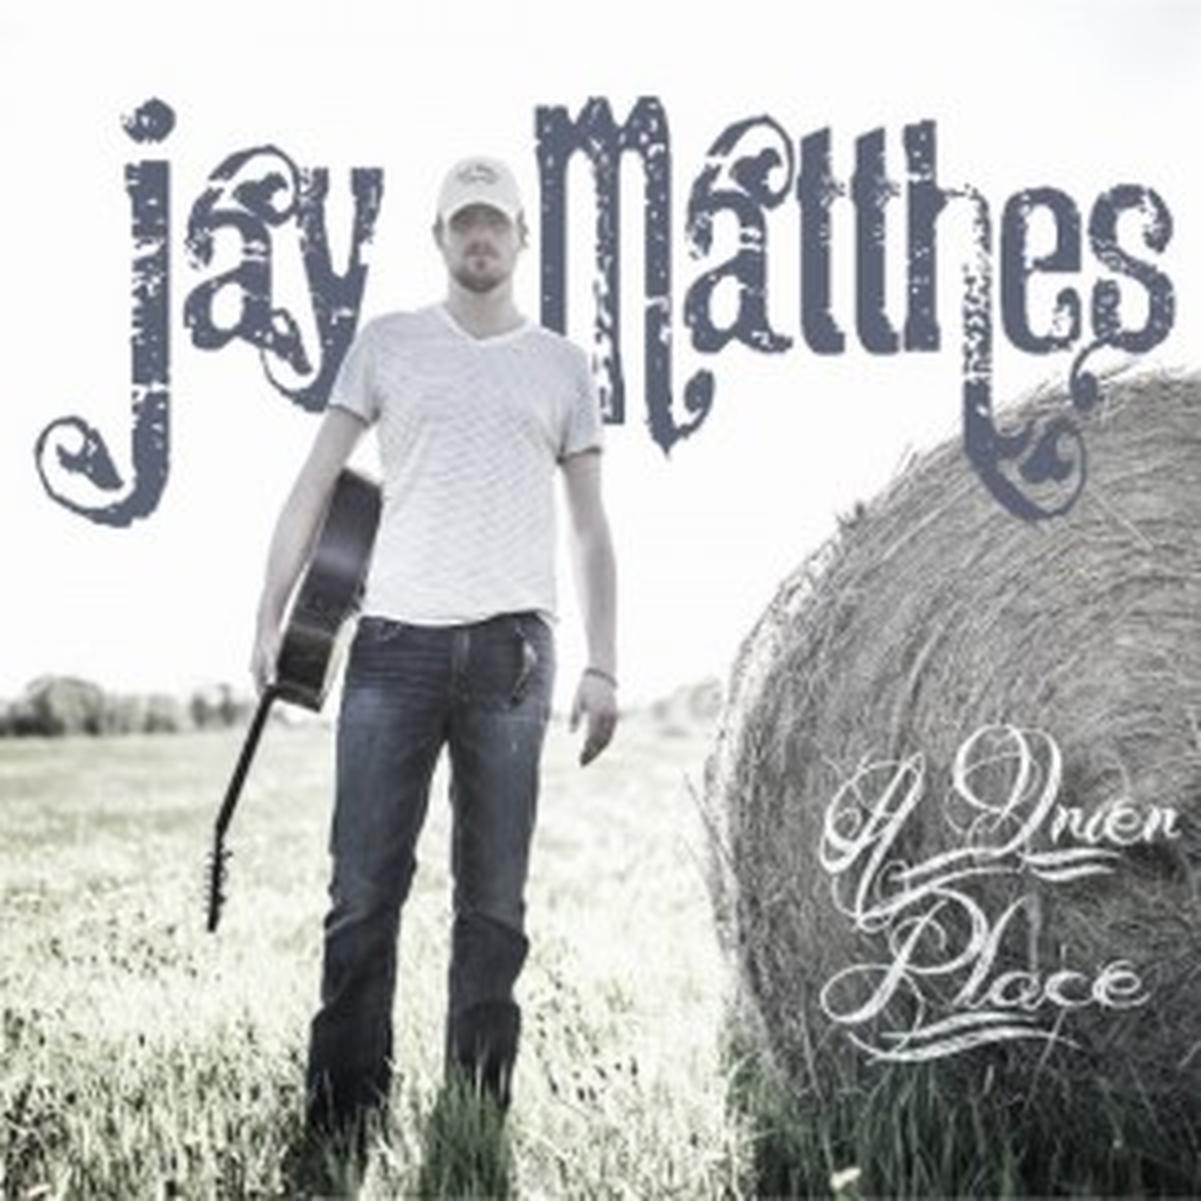 Jay Matthes